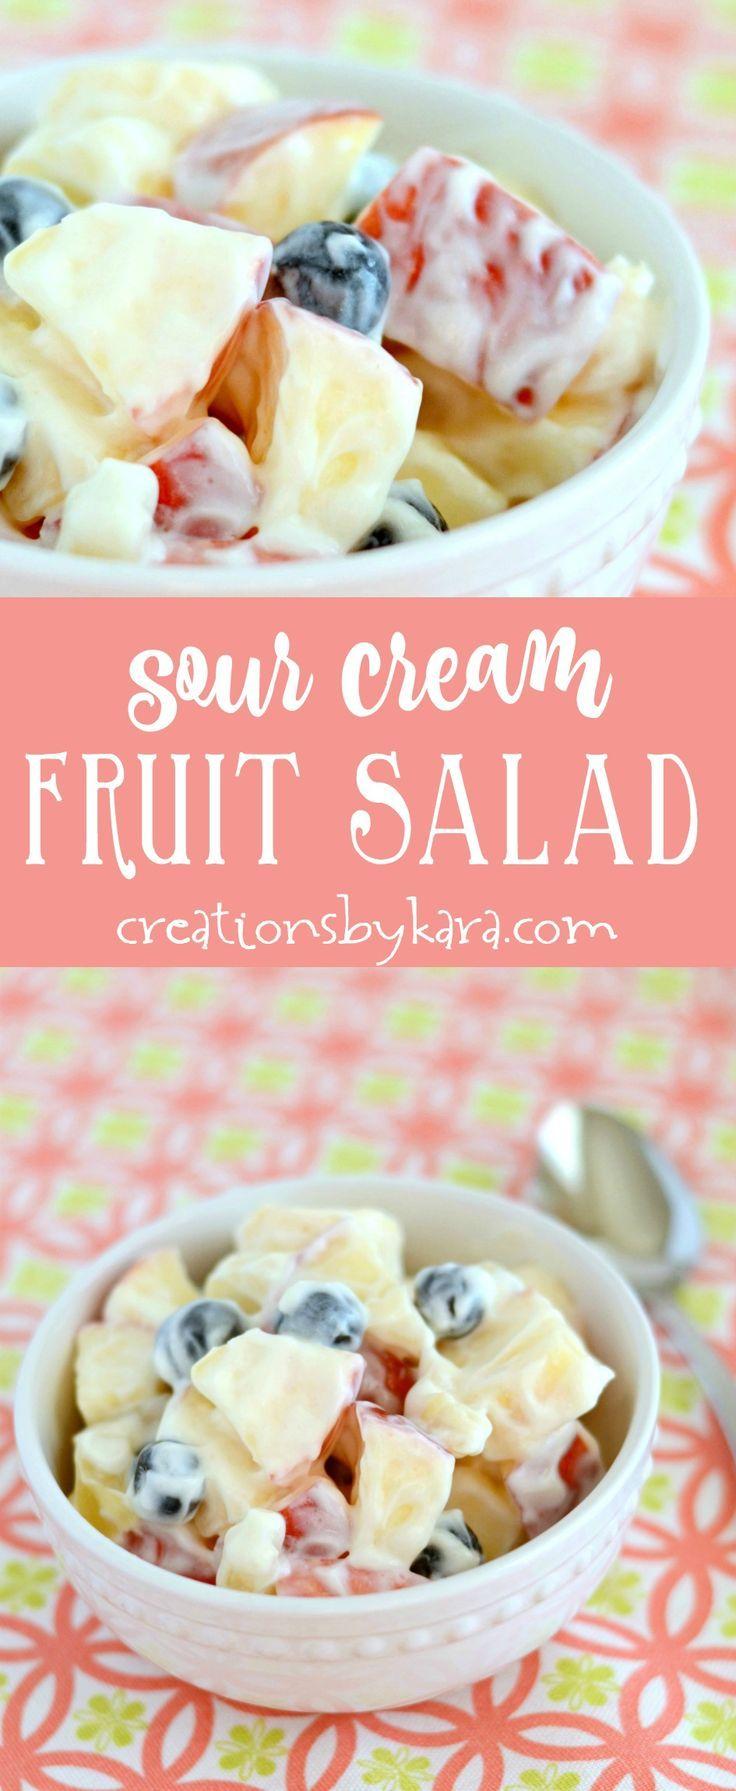 25 best ideas about easy fruit salad on pinterest jello fruit salads fruit salad yummy yummy. Black Bedroom Furniture Sets. Home Design Ideas